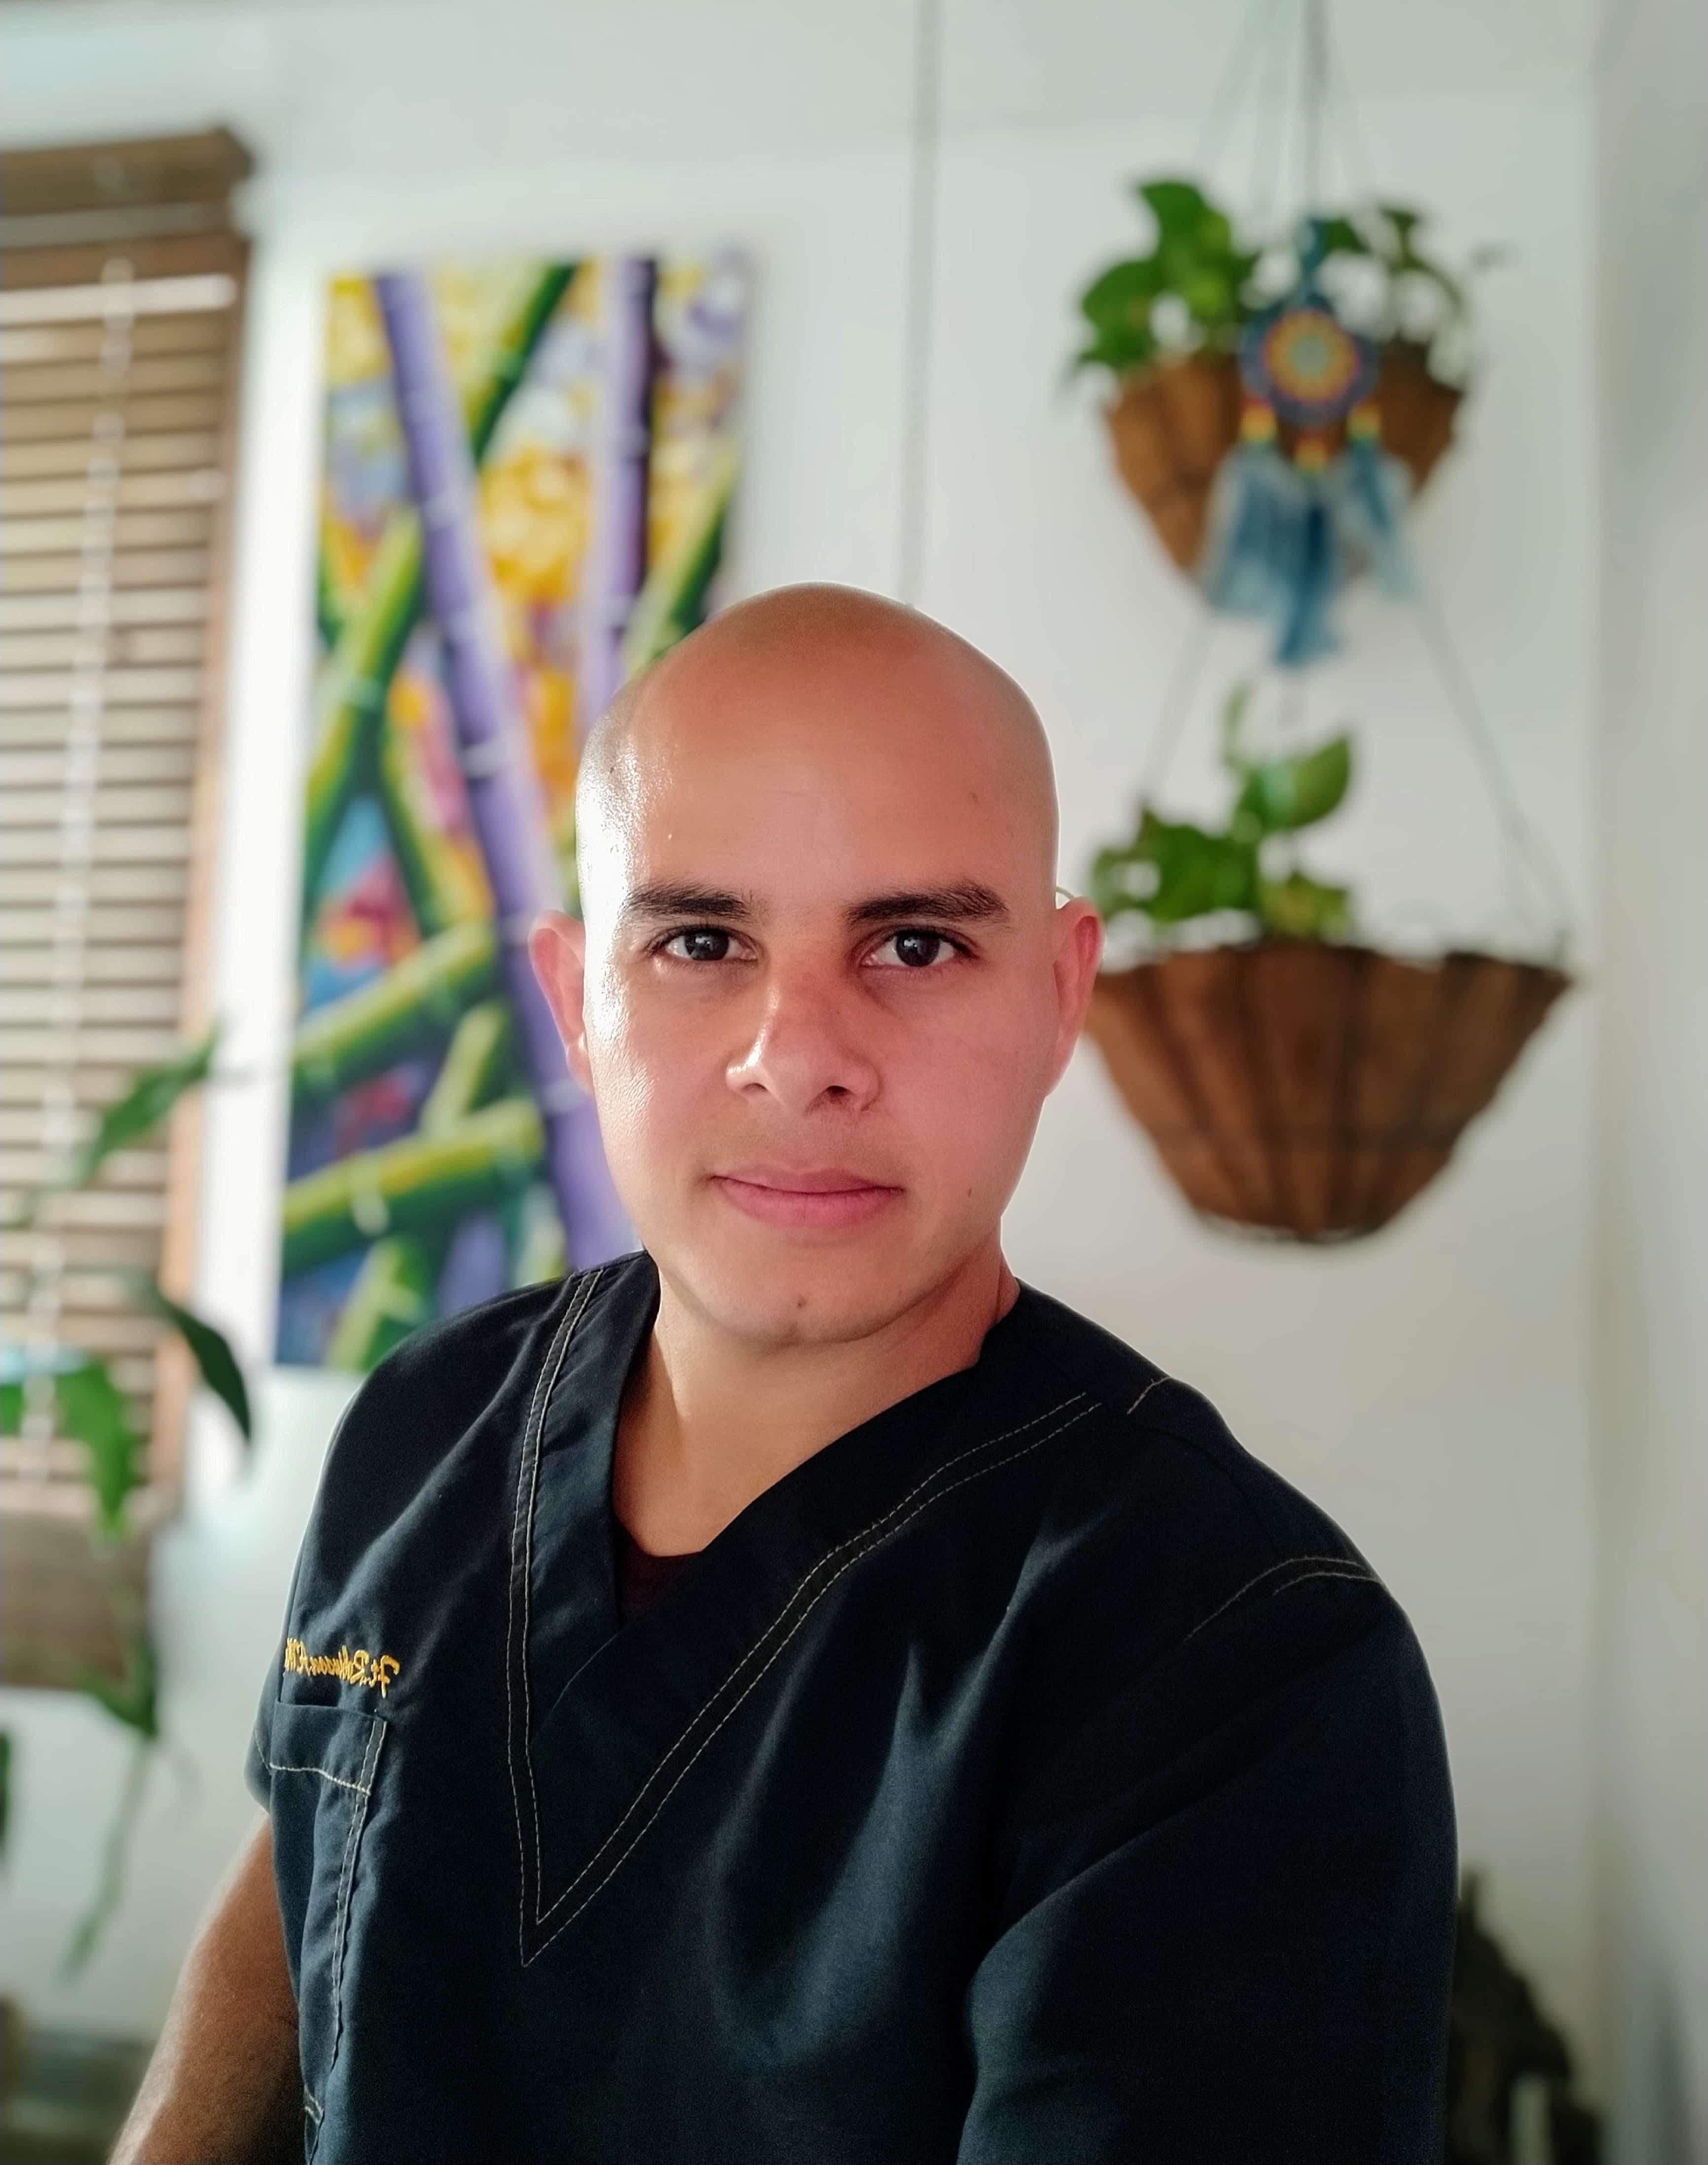 Robinson-Marquez